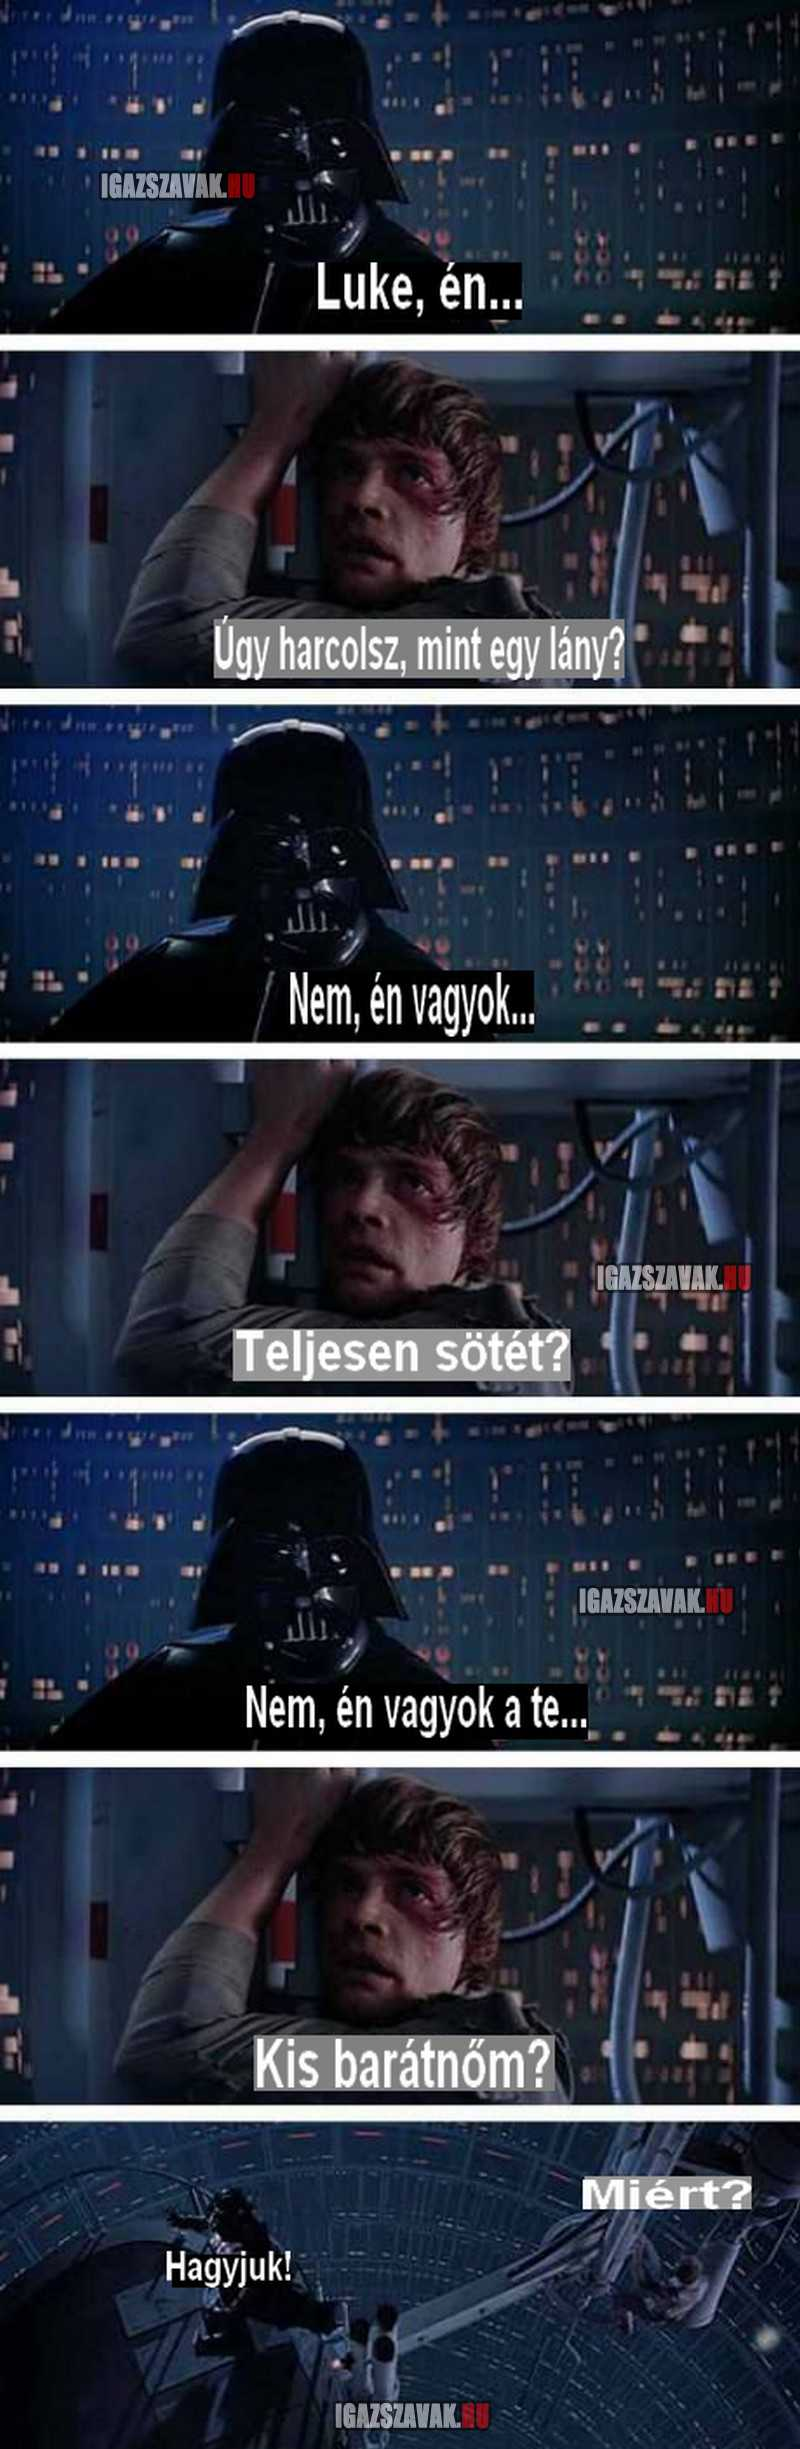 Star Wars, Luke  én...